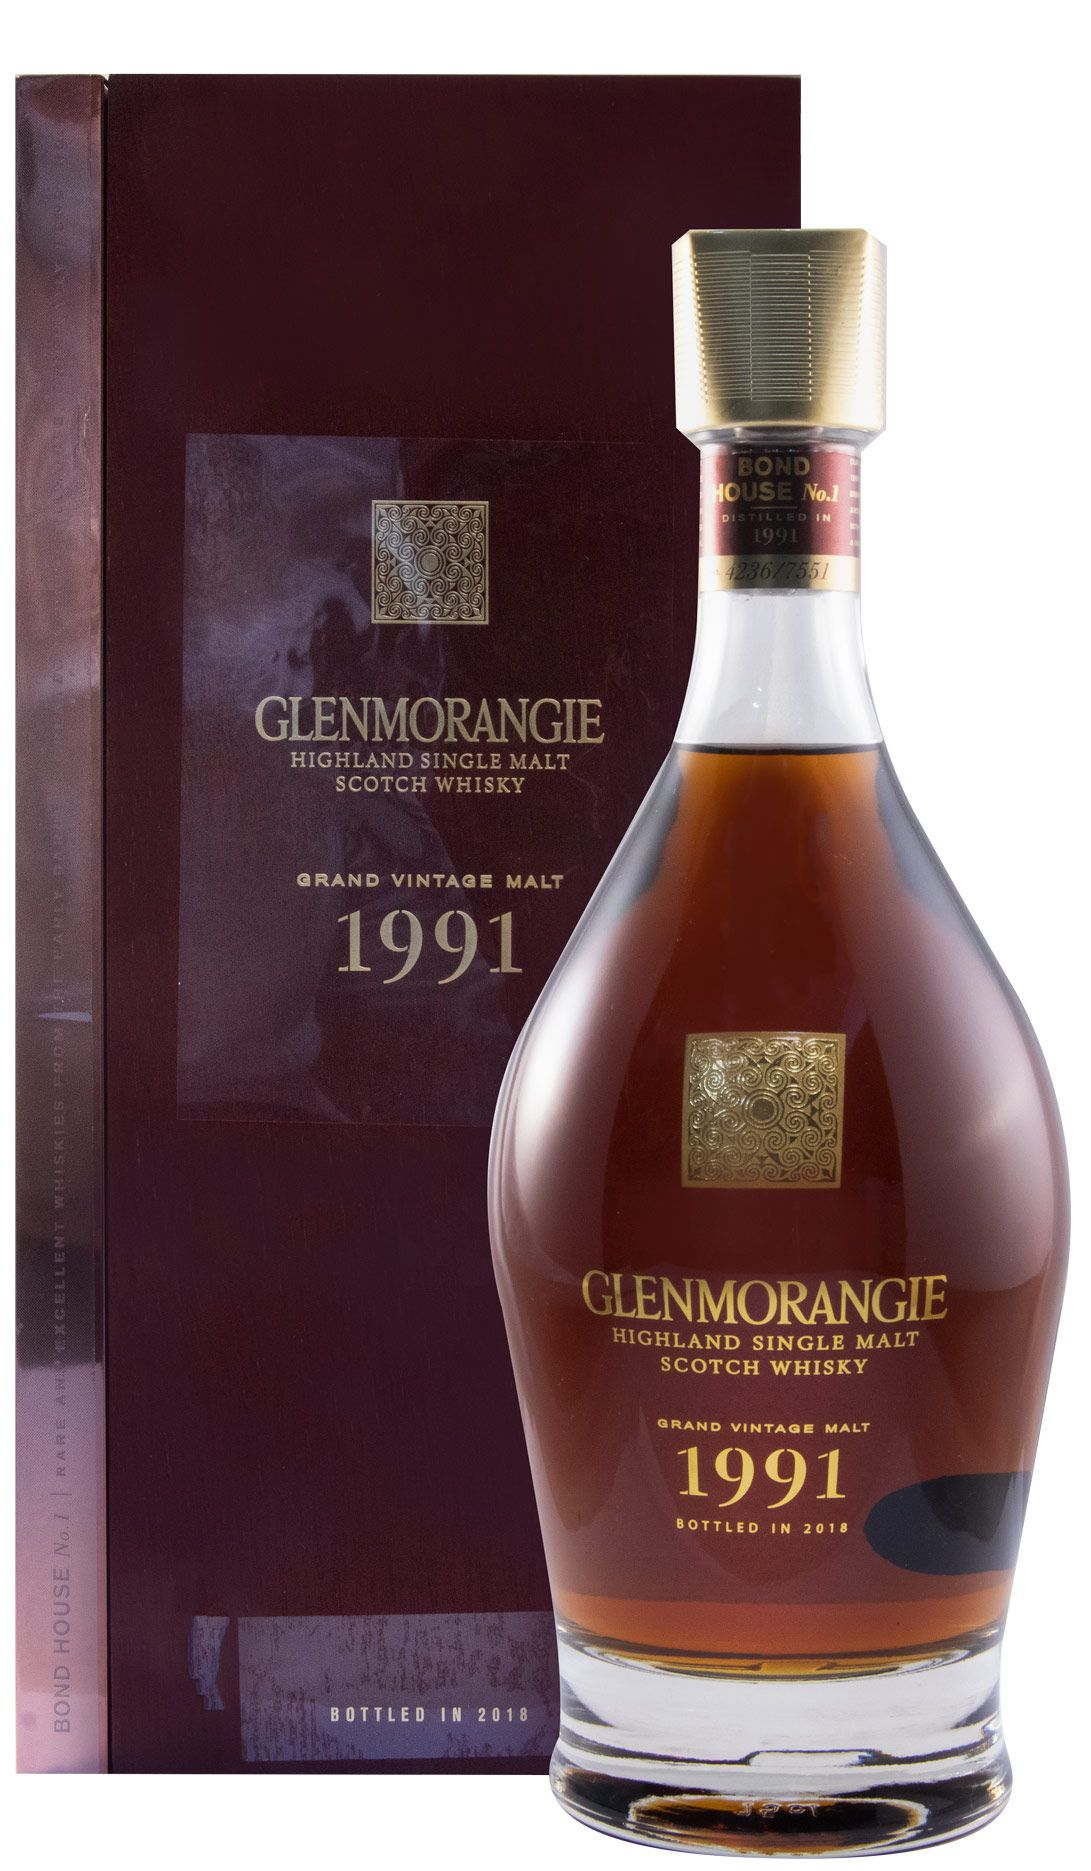 1991 Glenmorangie Grand Vintage Malte 75cl